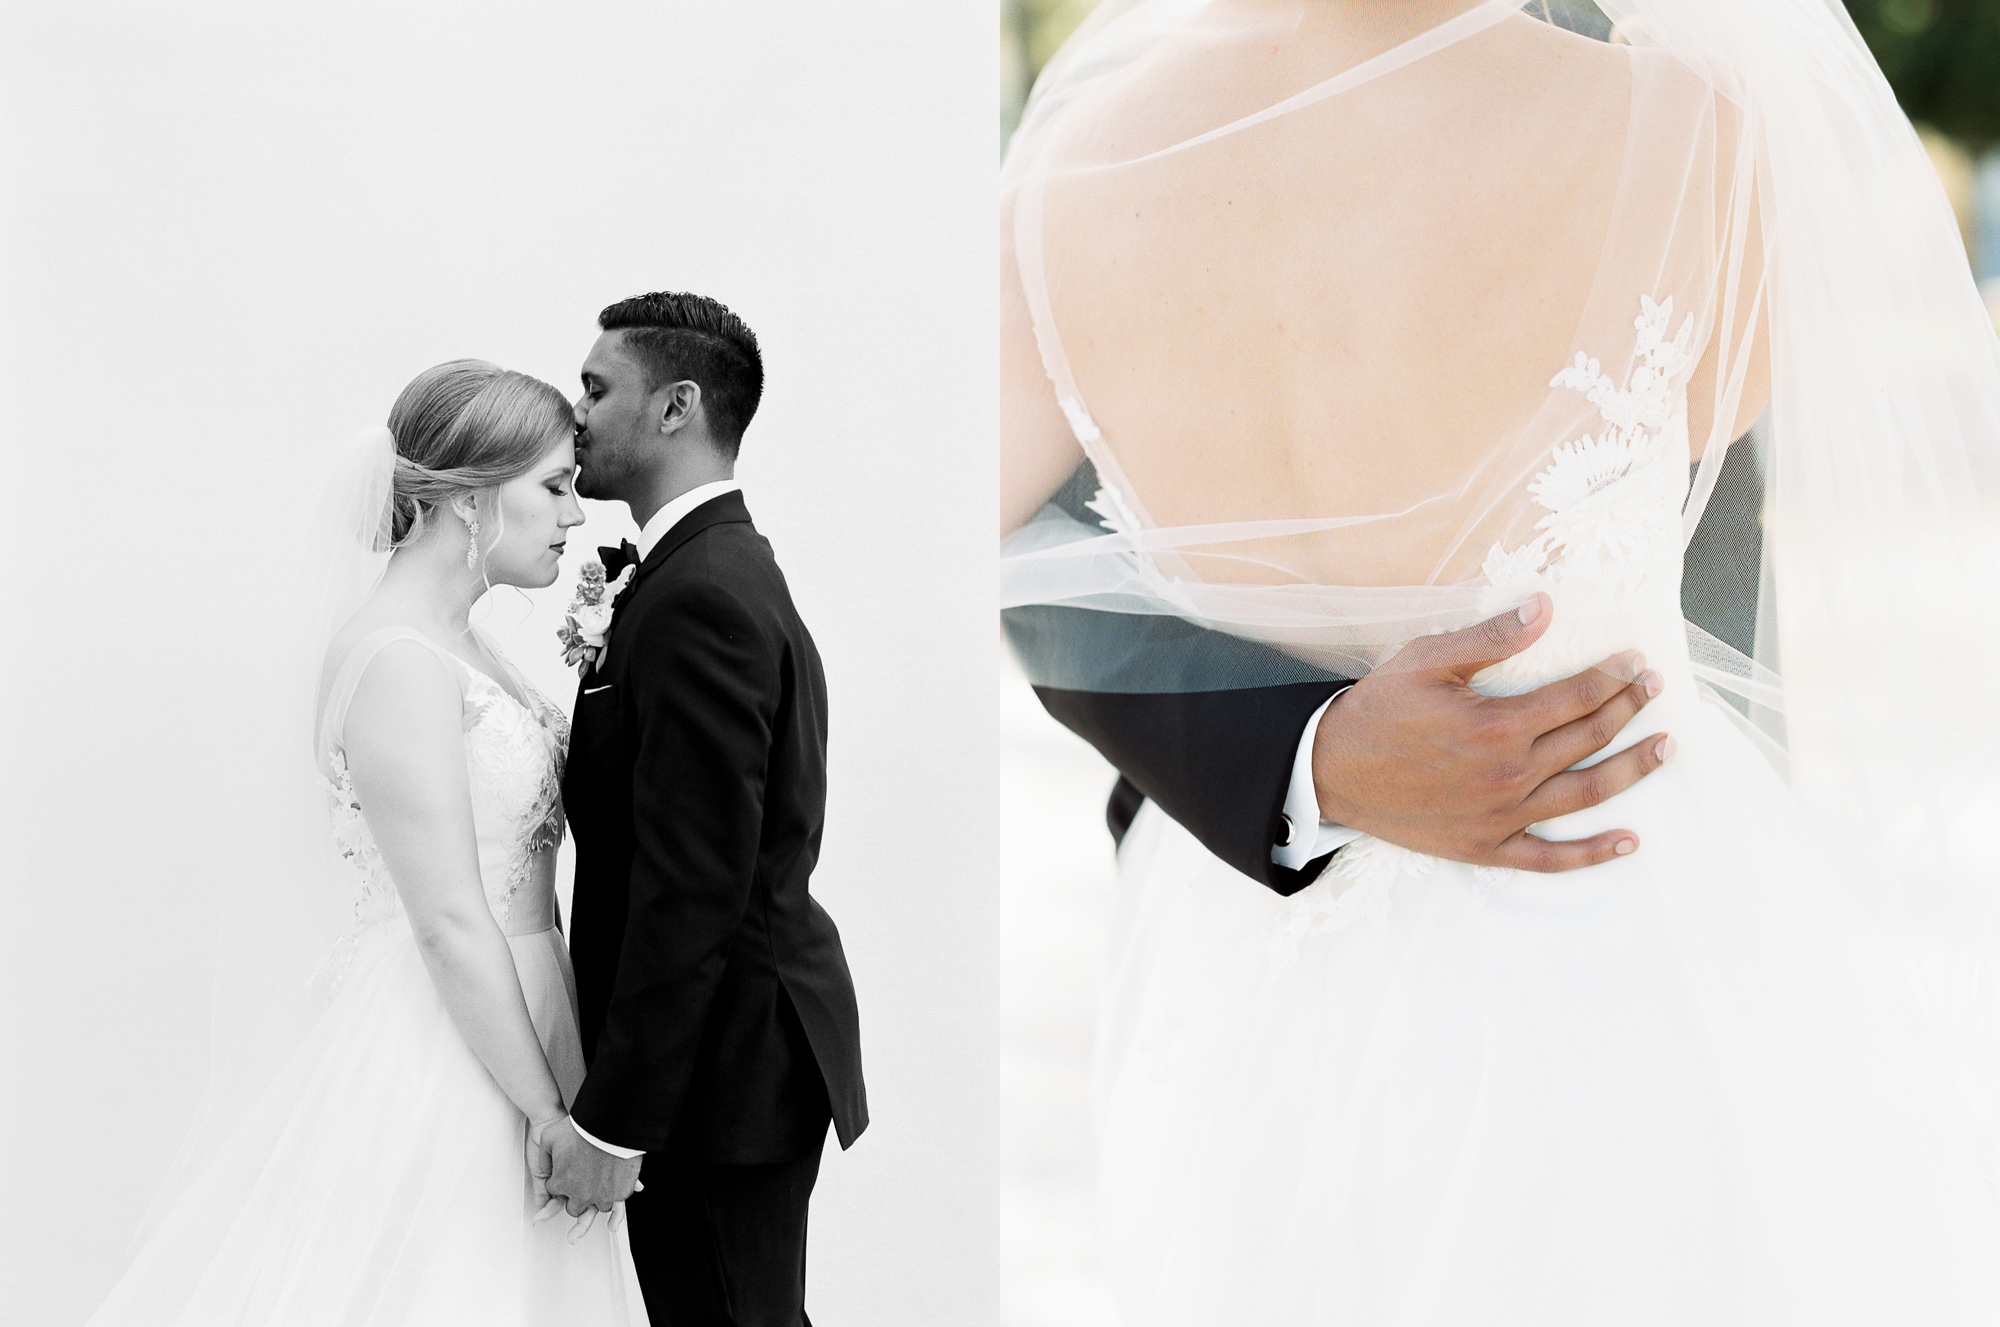 betsy-hotel-wedding-south-beach-miami-charleston-south-carolina-destination-wedding-photographer-17.jpg